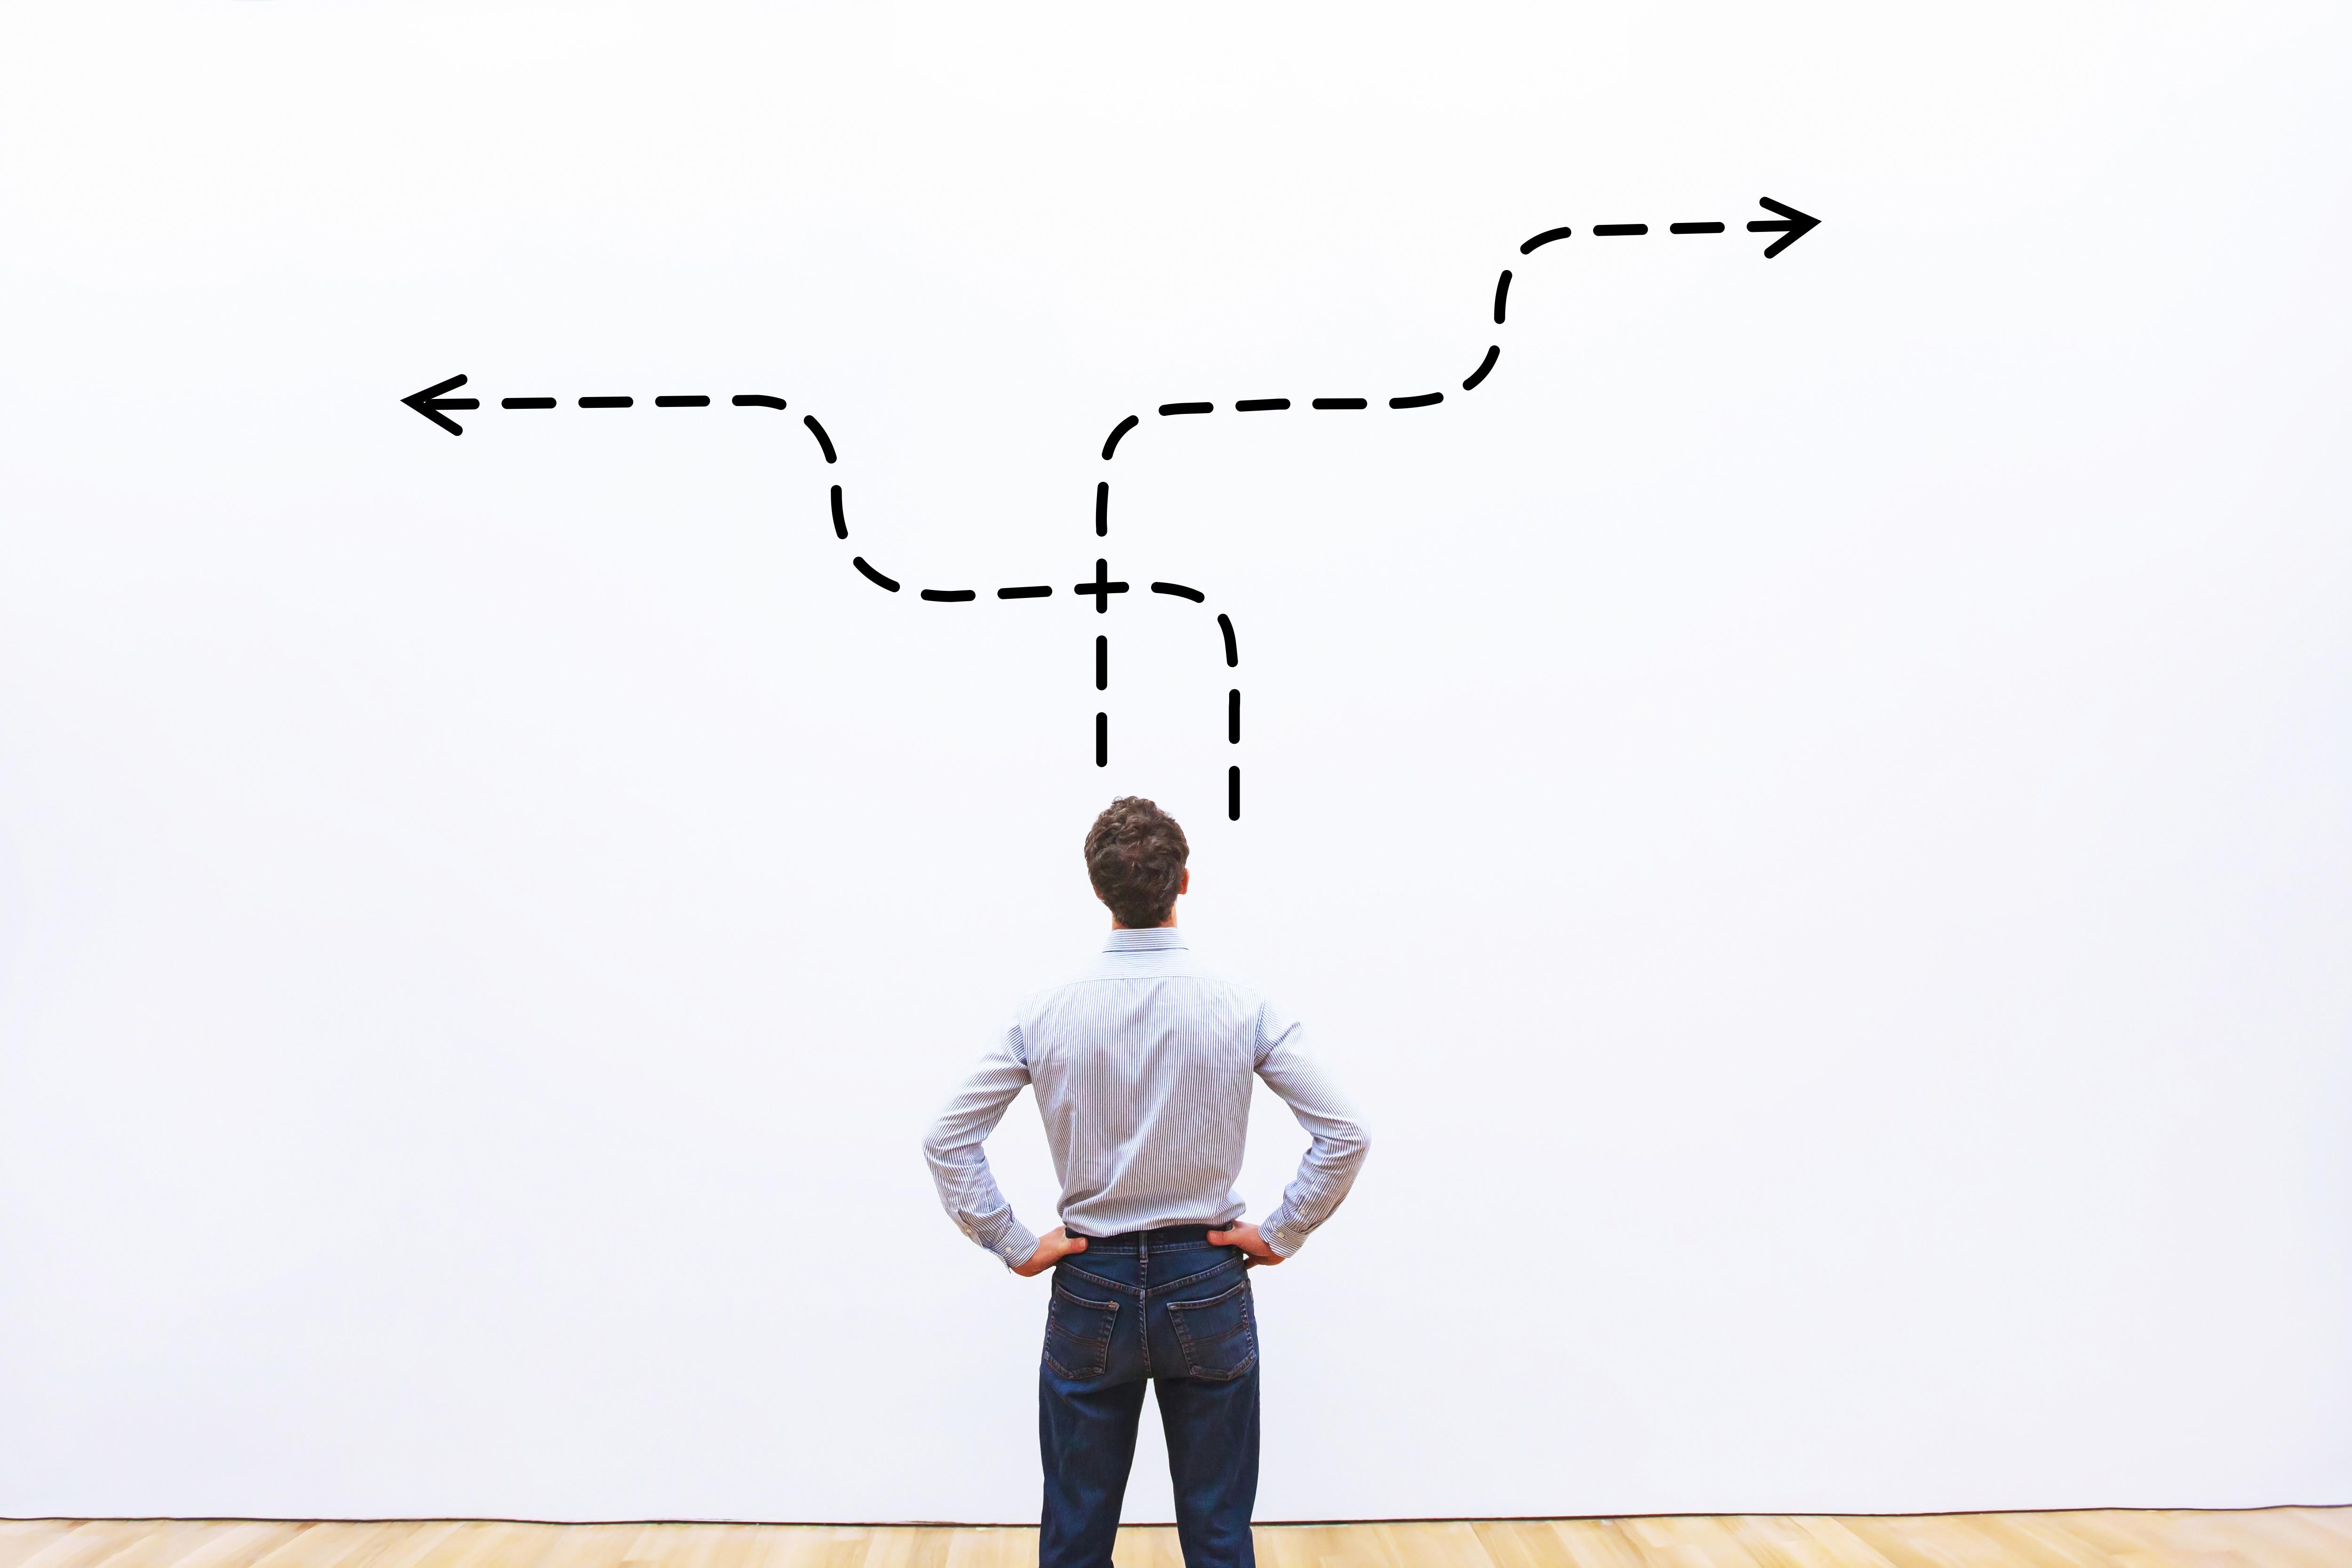 man making a decision